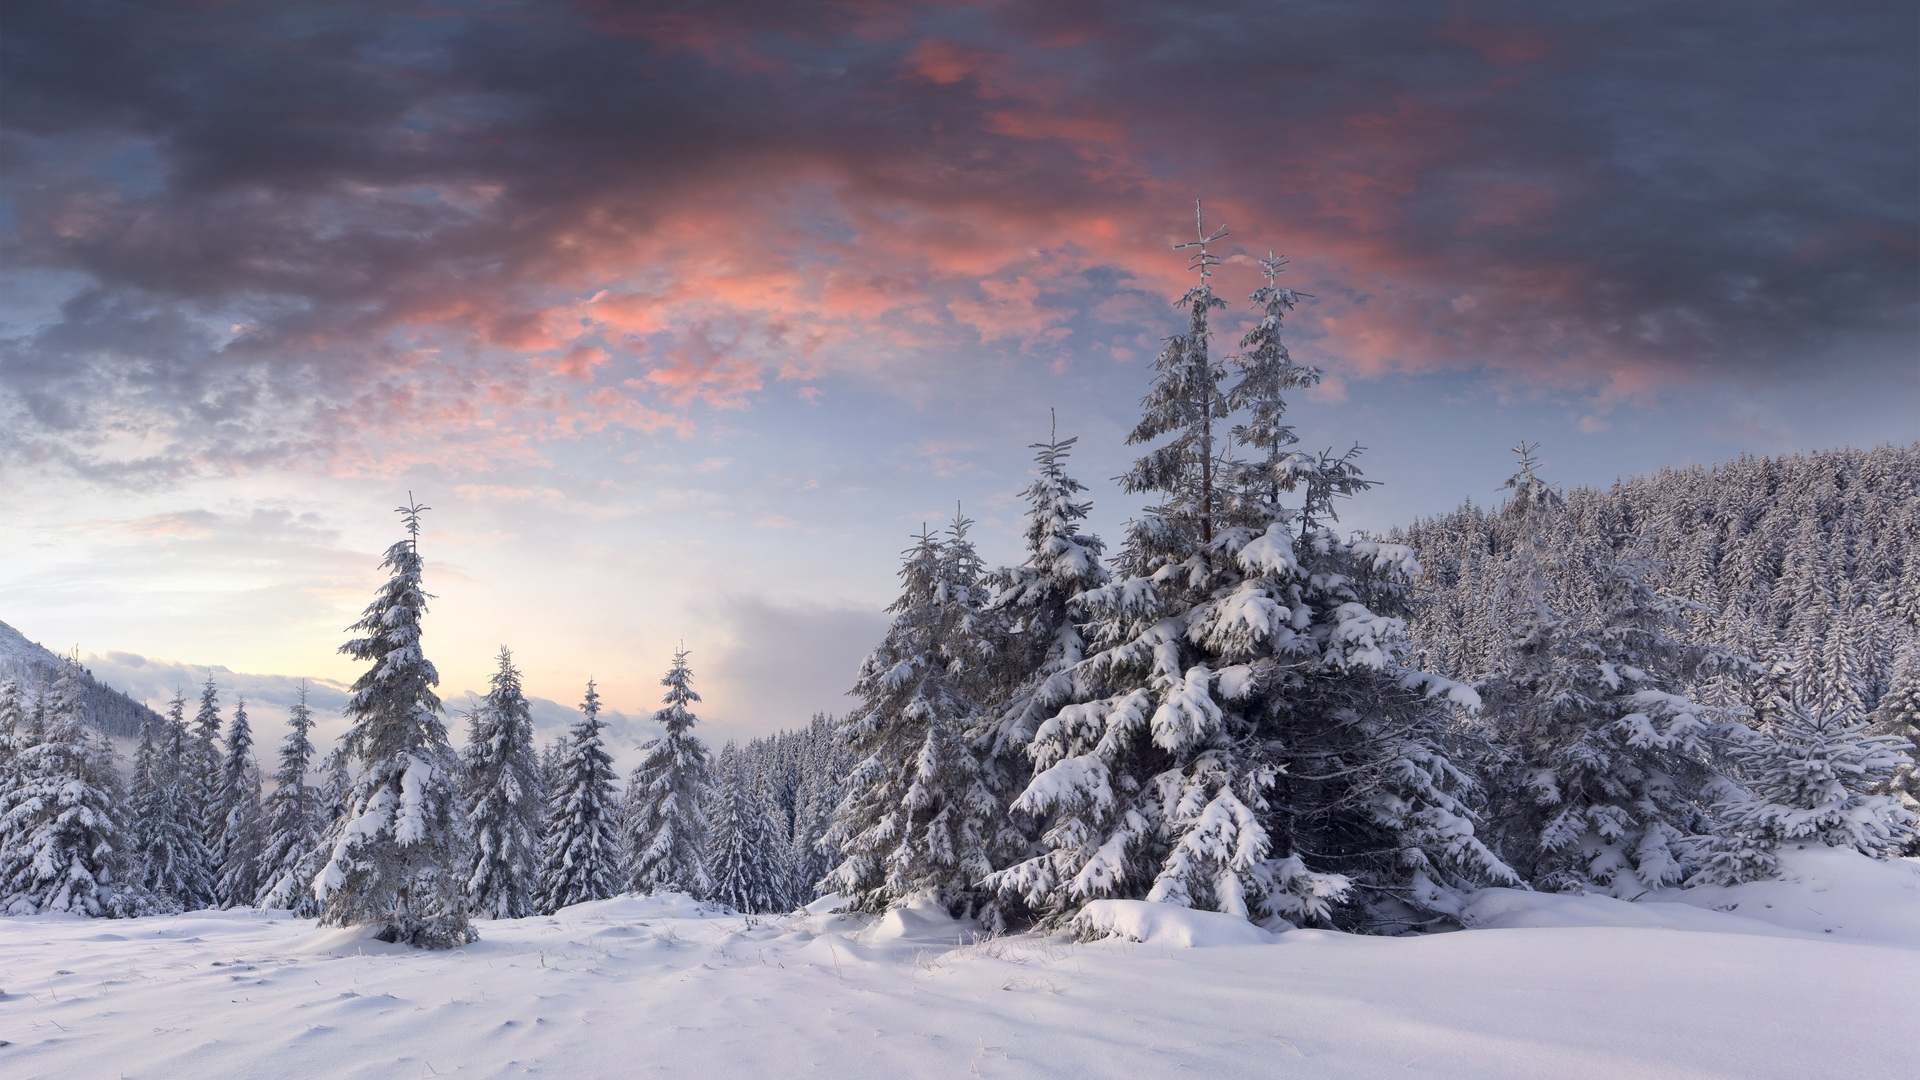 Winter Wallpaper Christmas Tree